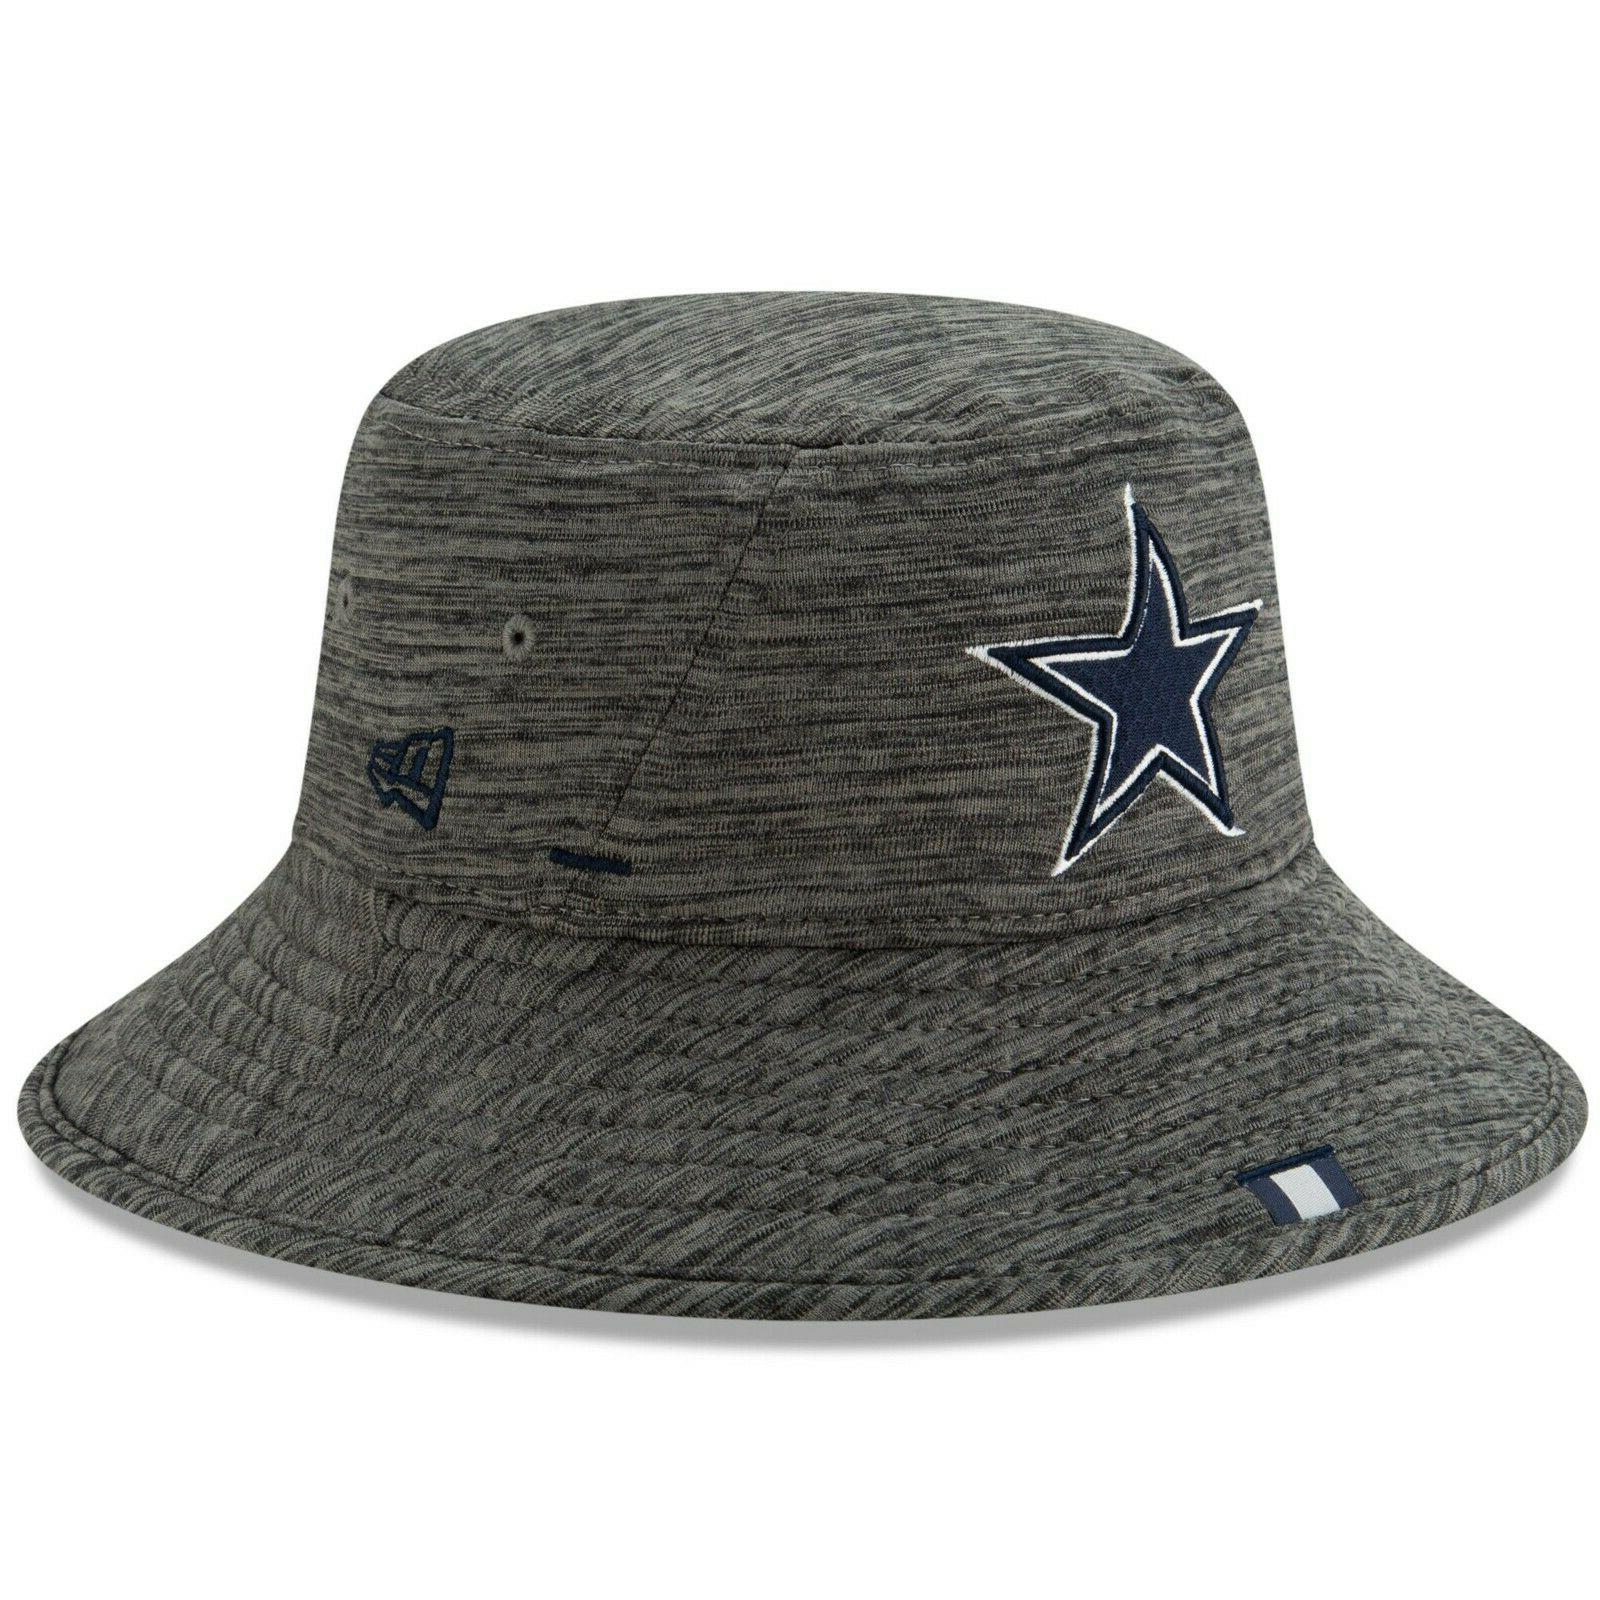 dallas cowboys graphite bucket hat 2019 training